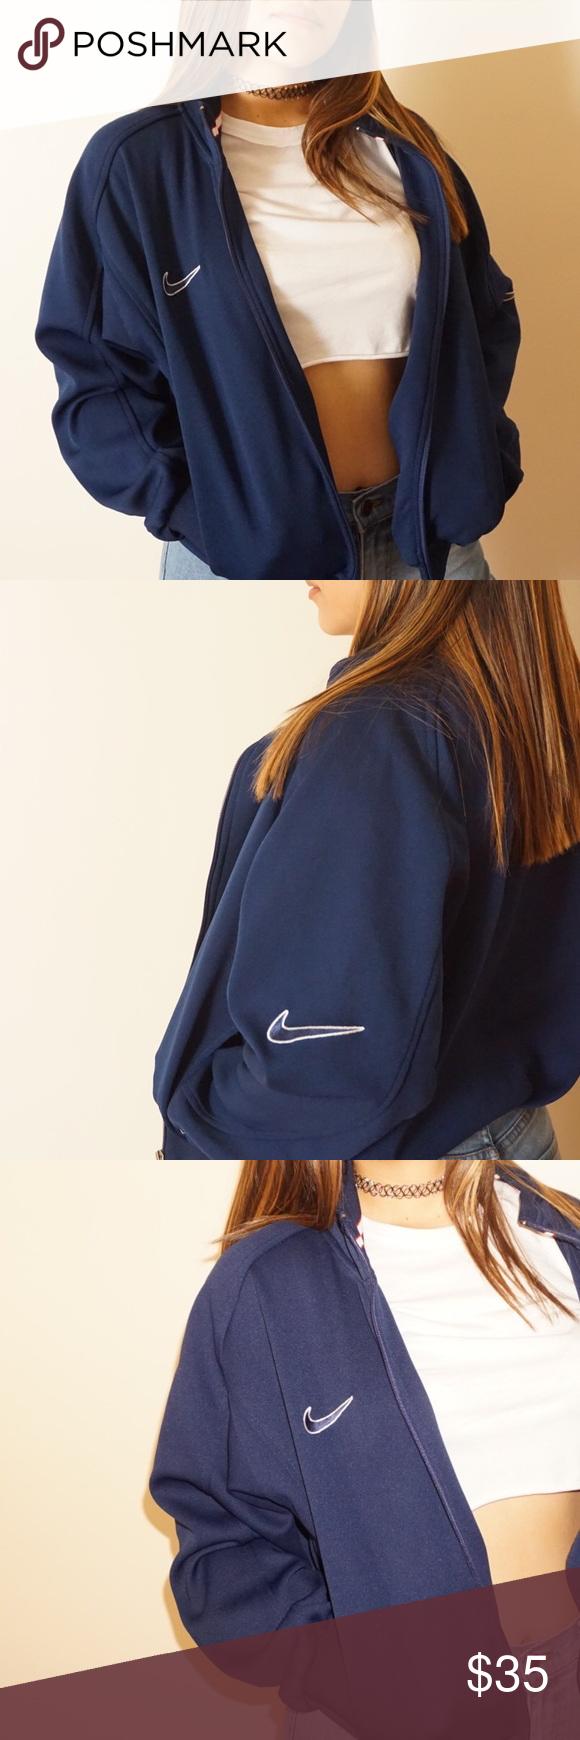 b44766ccbdec Vintage Nike Jacket Navy blue VINTAGE Nike Jacket! In beautiful condition! Nike  Jackets Coats